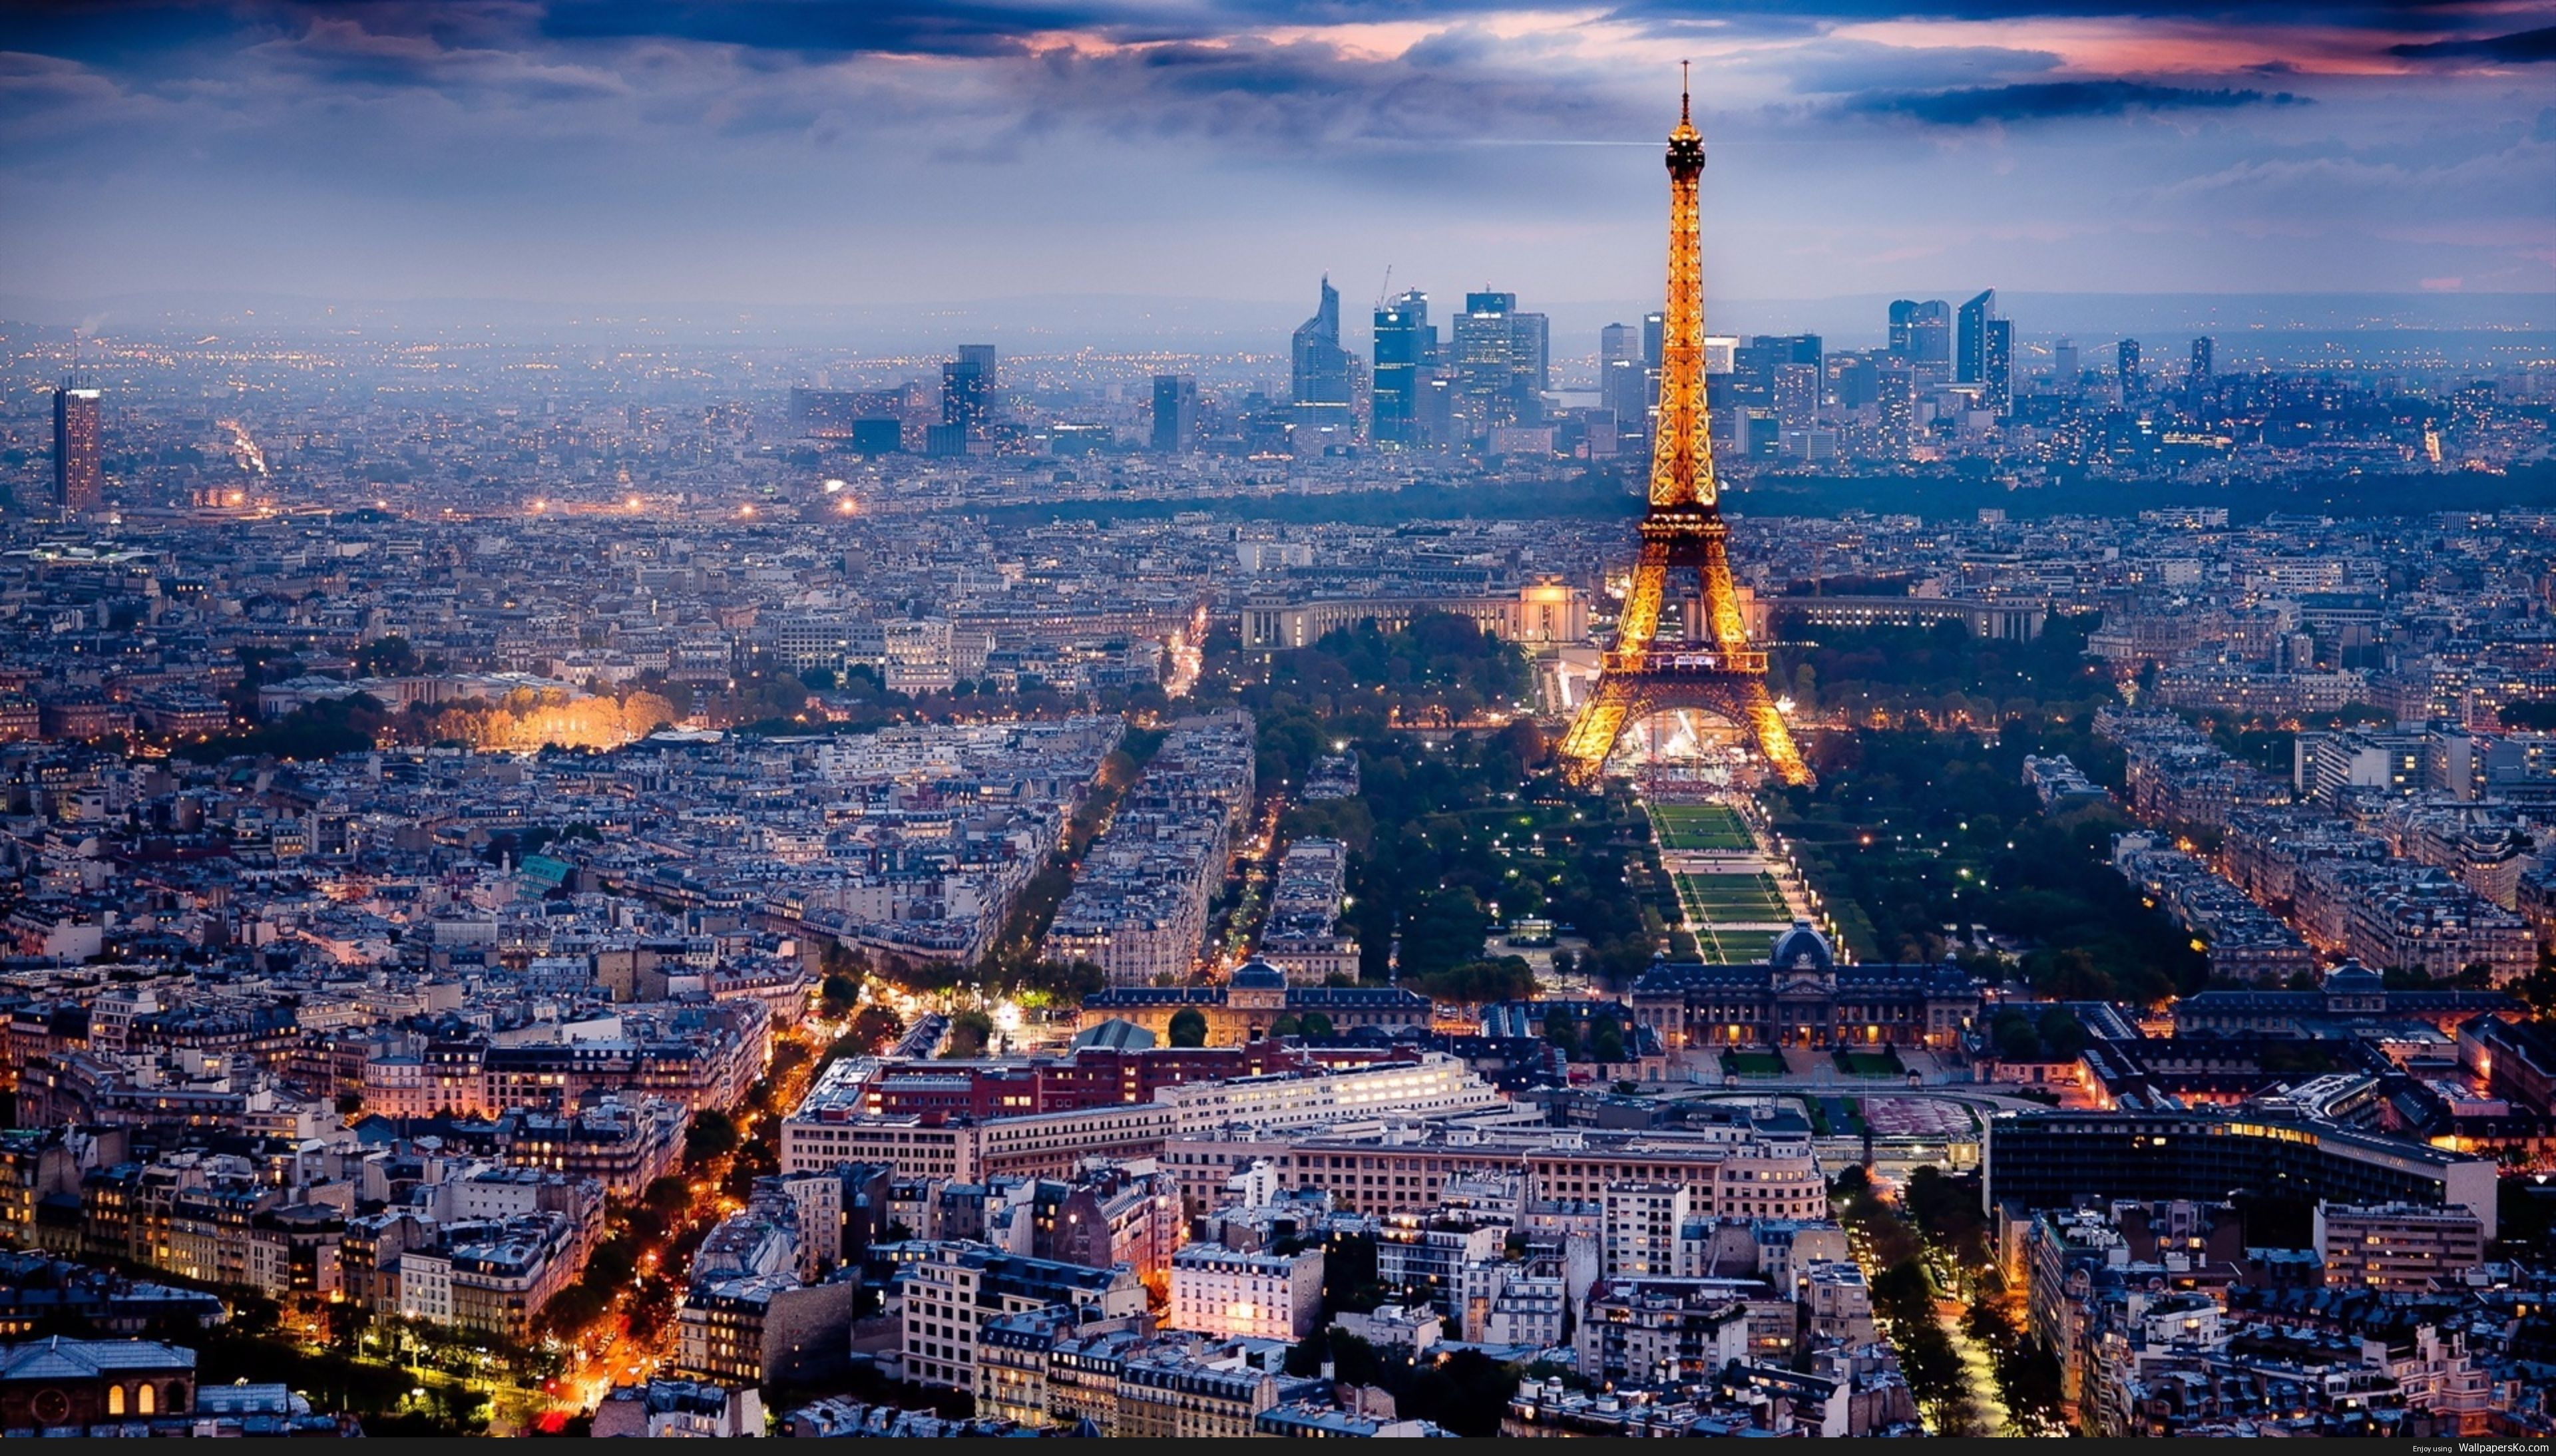 Paris 4k Wallpaper Http Wallpapersko Com Paris 4k Wallpaper Html Hd Wallpapers Download Paris Wallpaper Paris Paris At Night